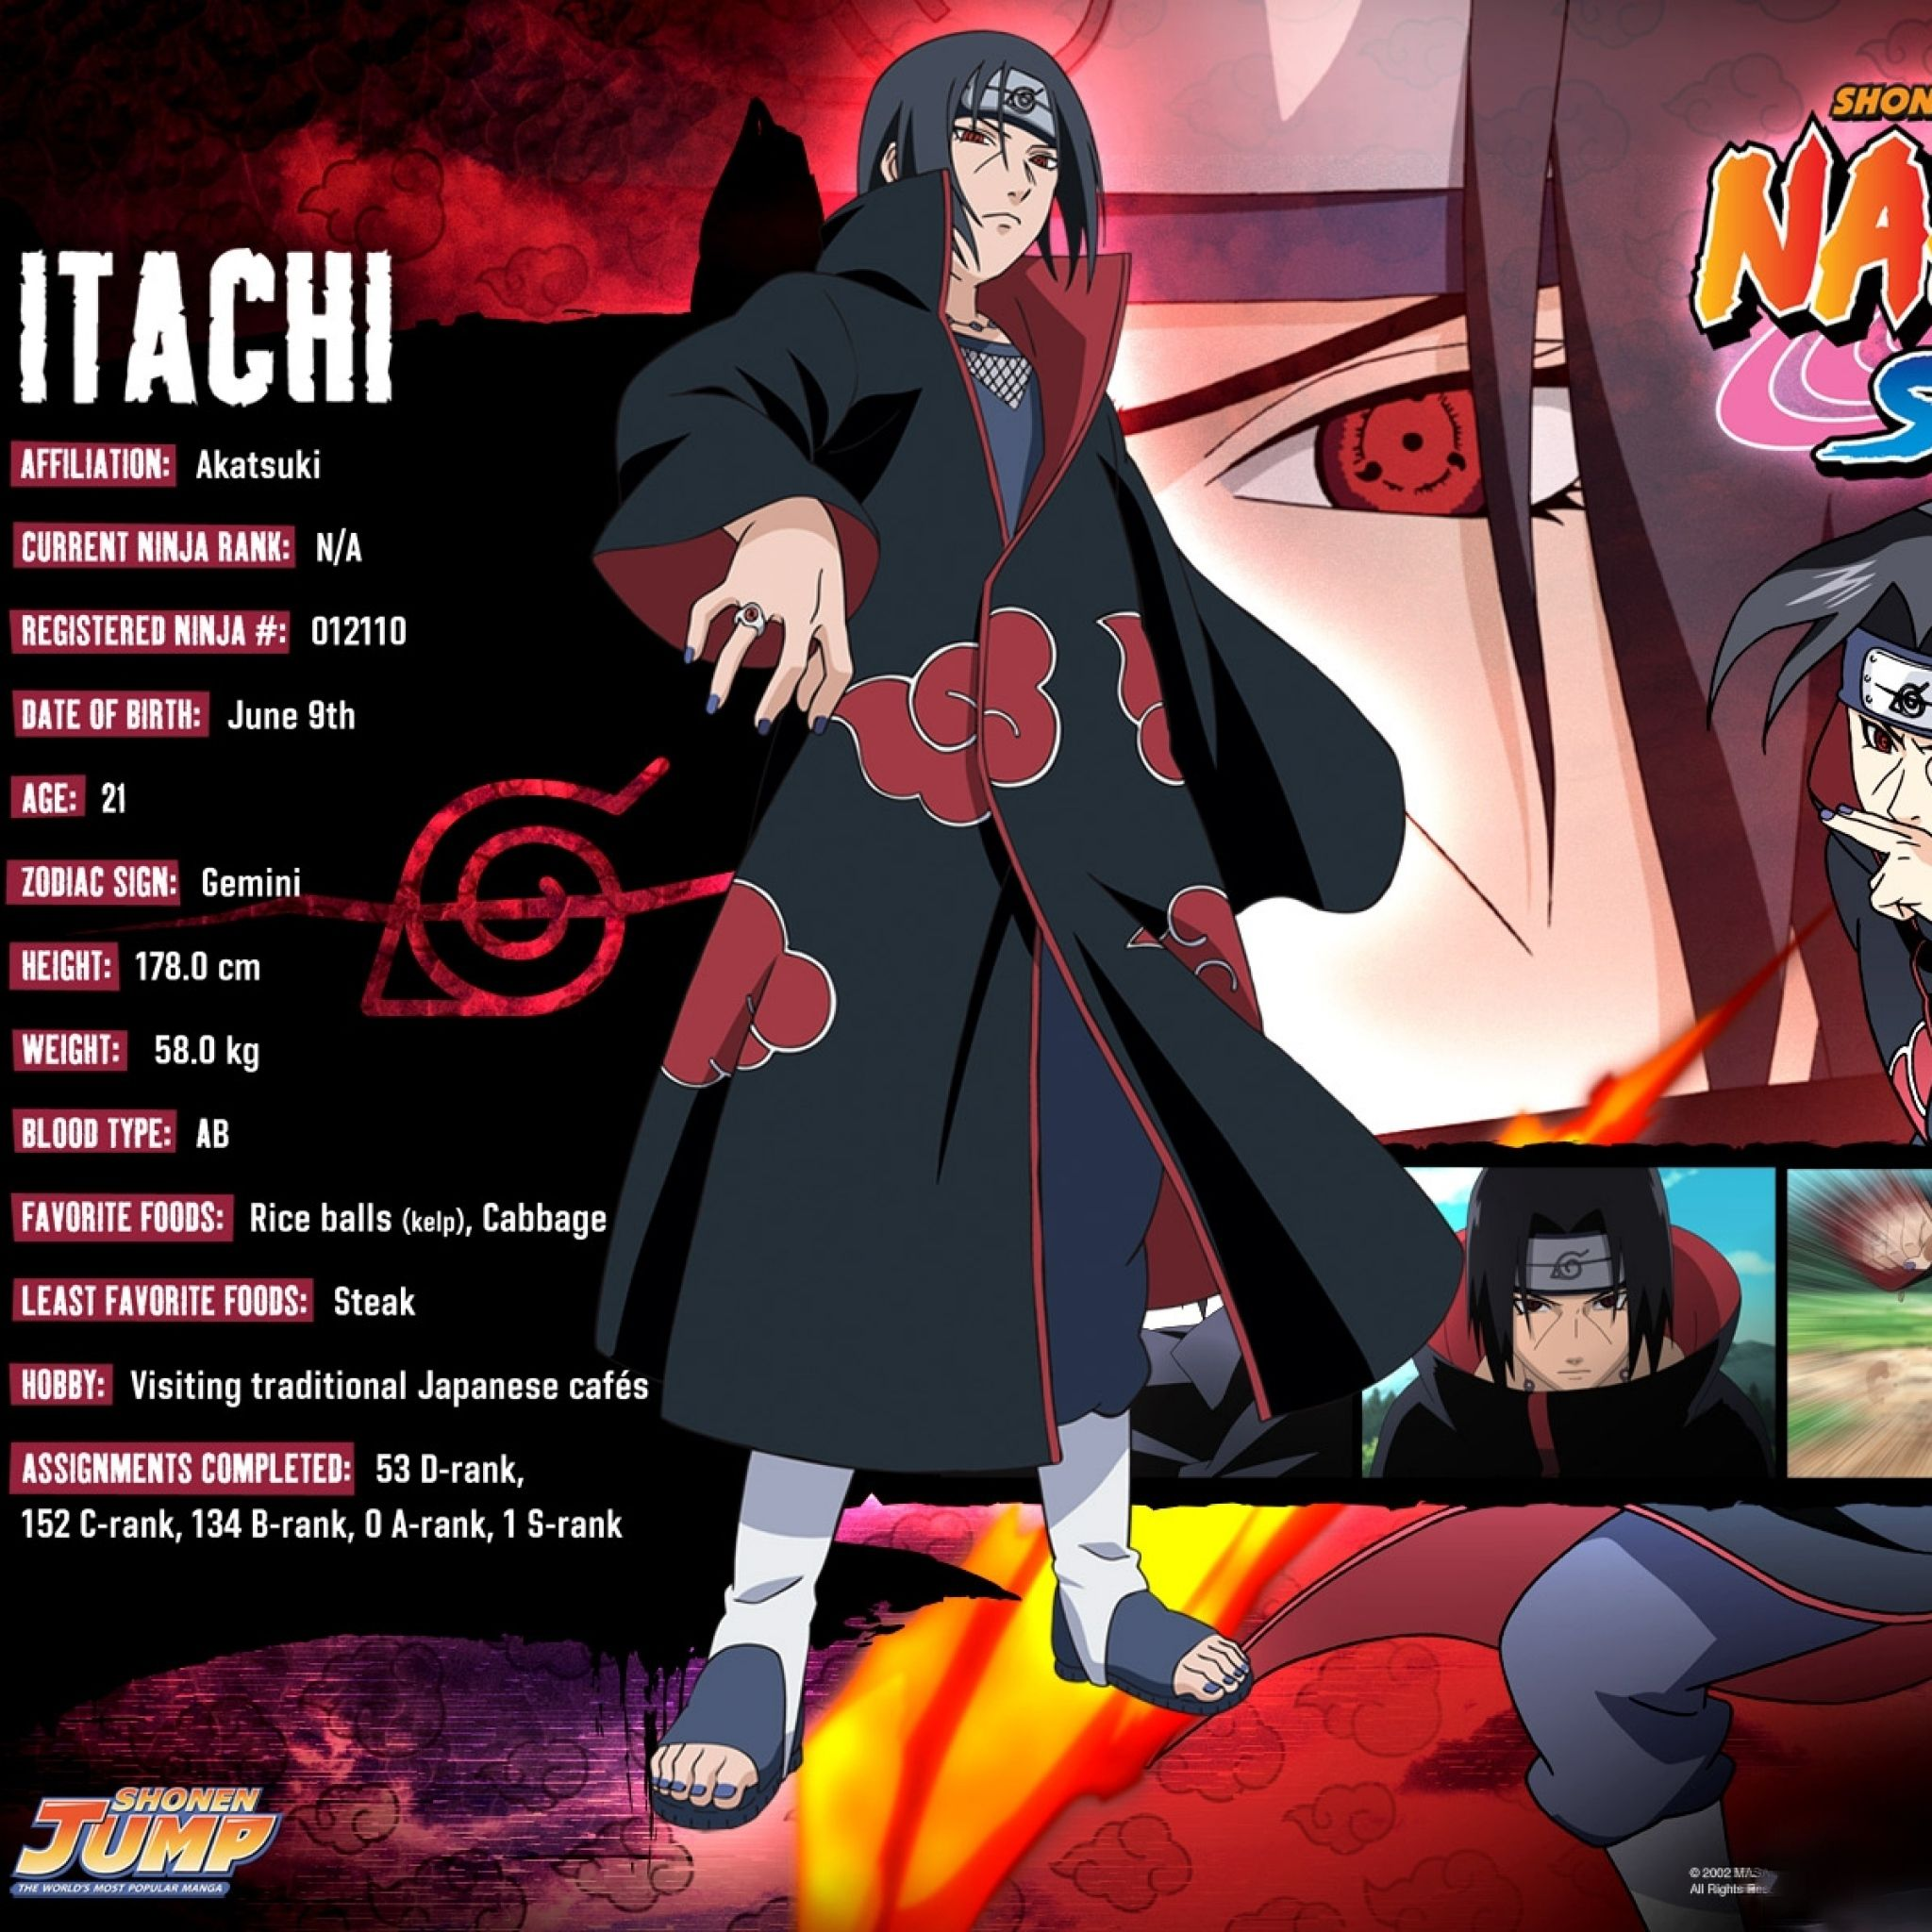 Beautiful Wallpaper Naruto Ipad Air - c6cf4e0ec4a0042c5a110fe2c53e1c29  Best Photo Reference_132779.jpg